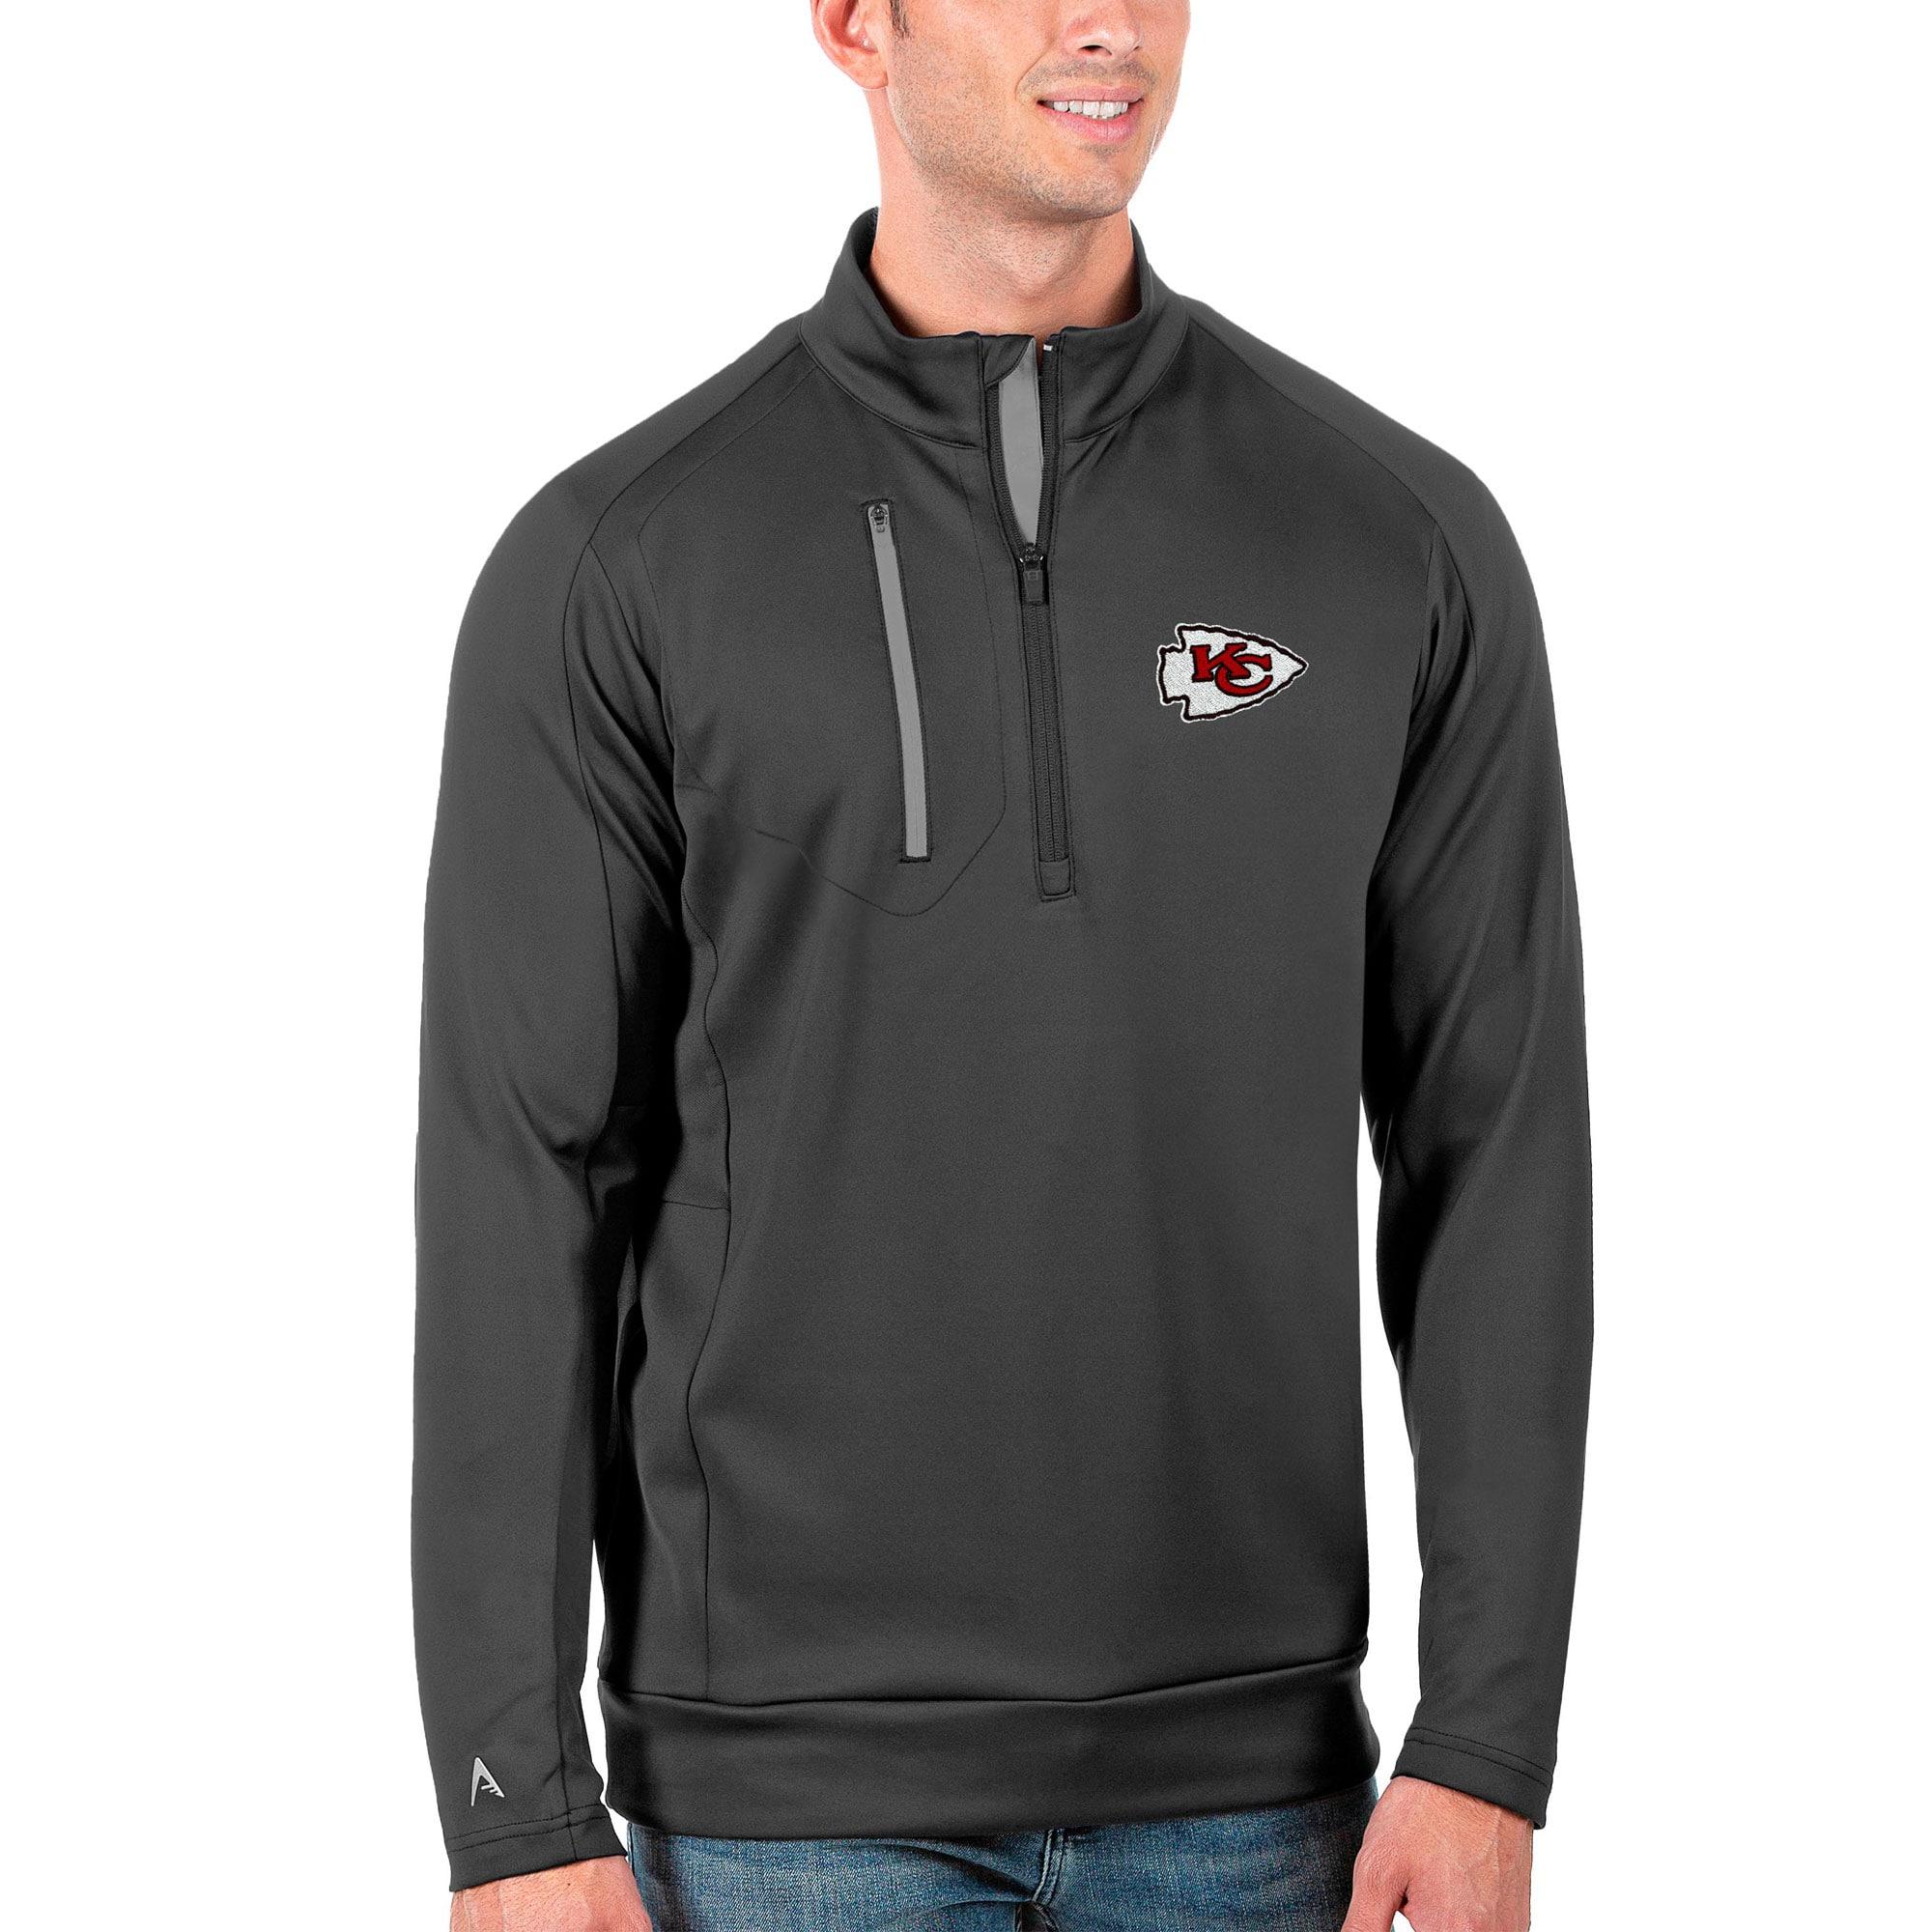 Kansas City Chiefs Antigua Generation Quarter-Zip Pullover Jacket - Charcoal/Silver